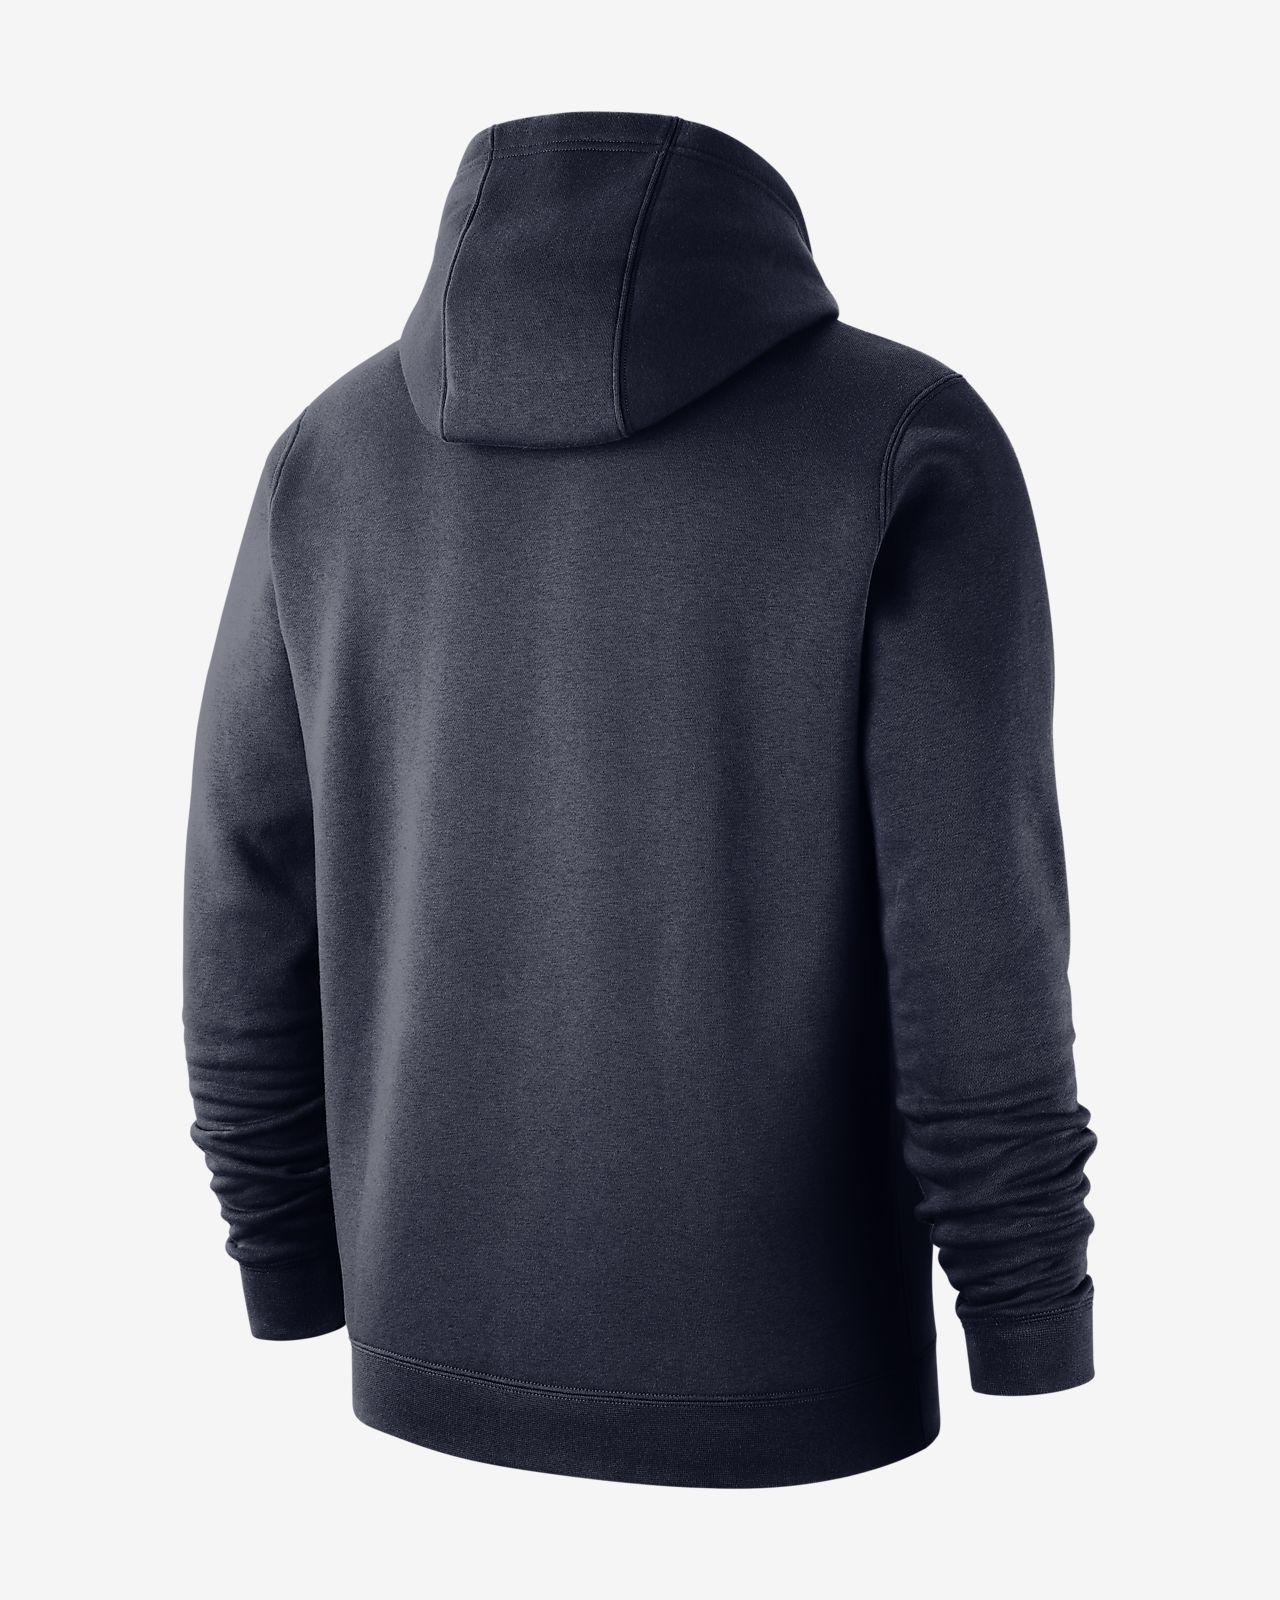 new product 34566 06a56 Dallas Mavericks Nike Men's NBA Hoodie